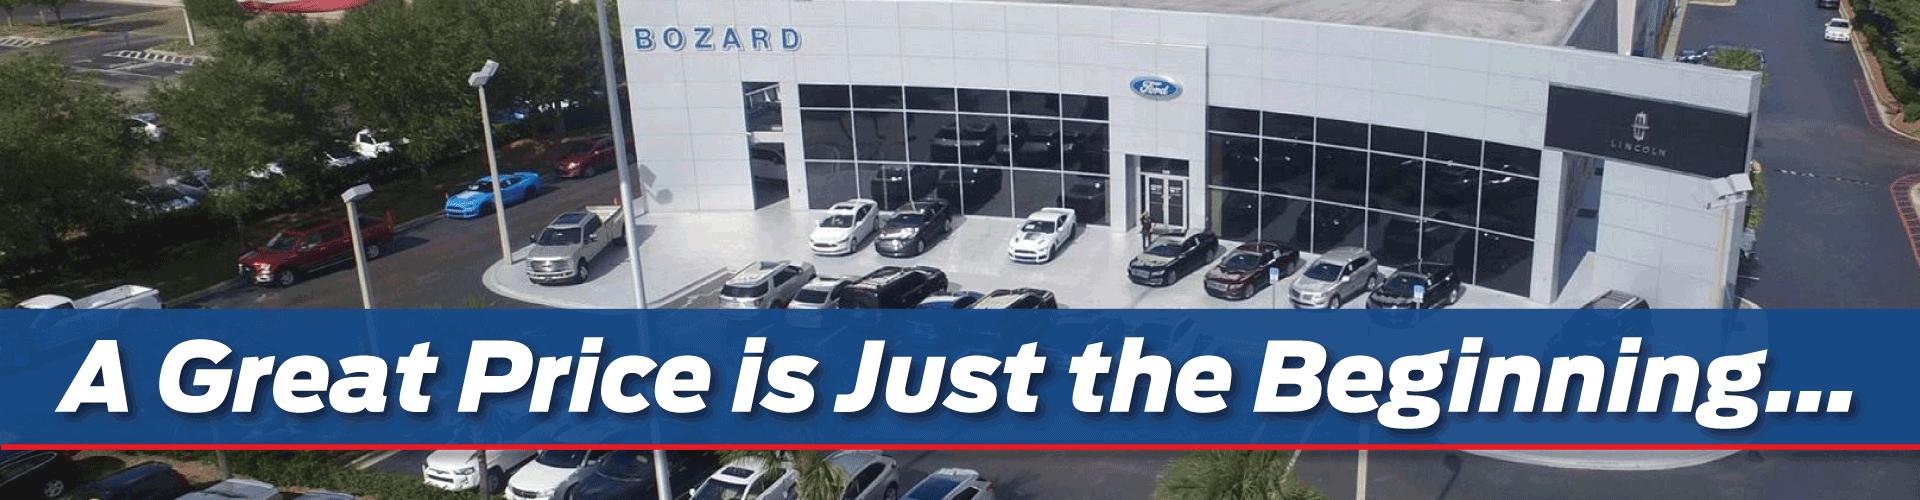 Bozard Ford Premier Ford Dealer Near Jacksonville FL - Ford edge invoice price